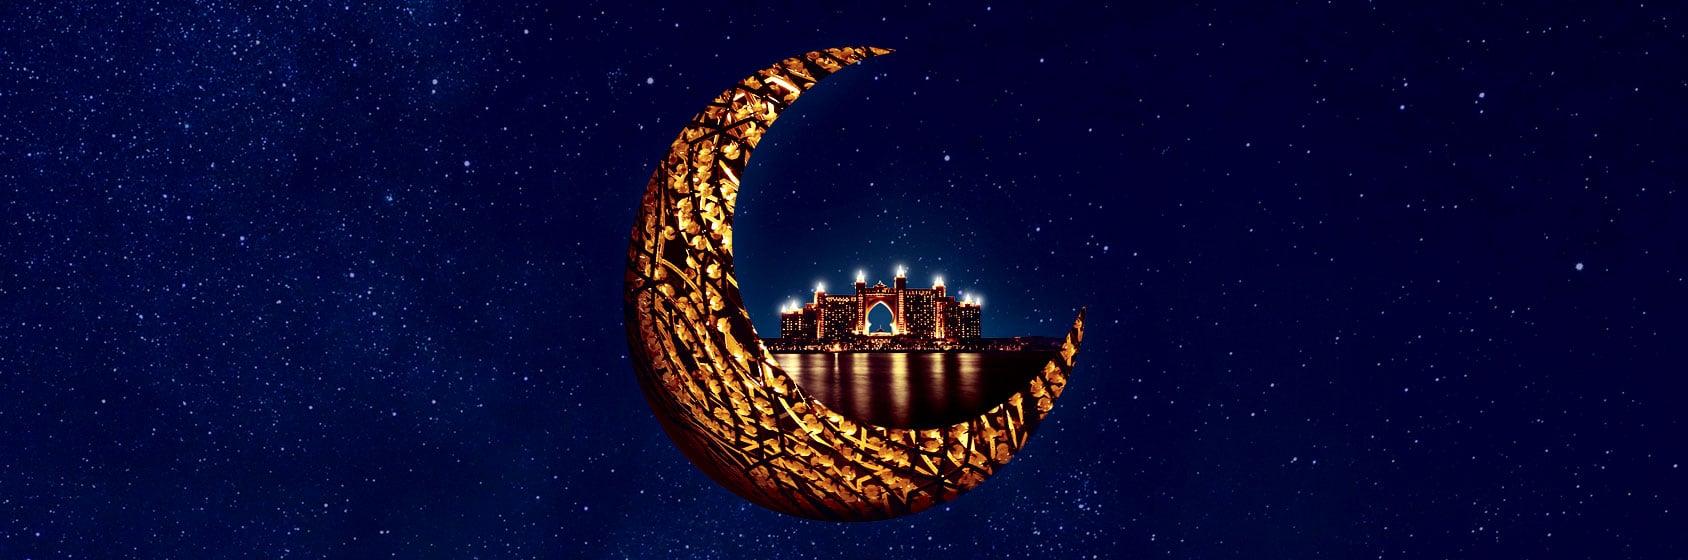 Celebrate Ramadan at Atlantis, The Palm